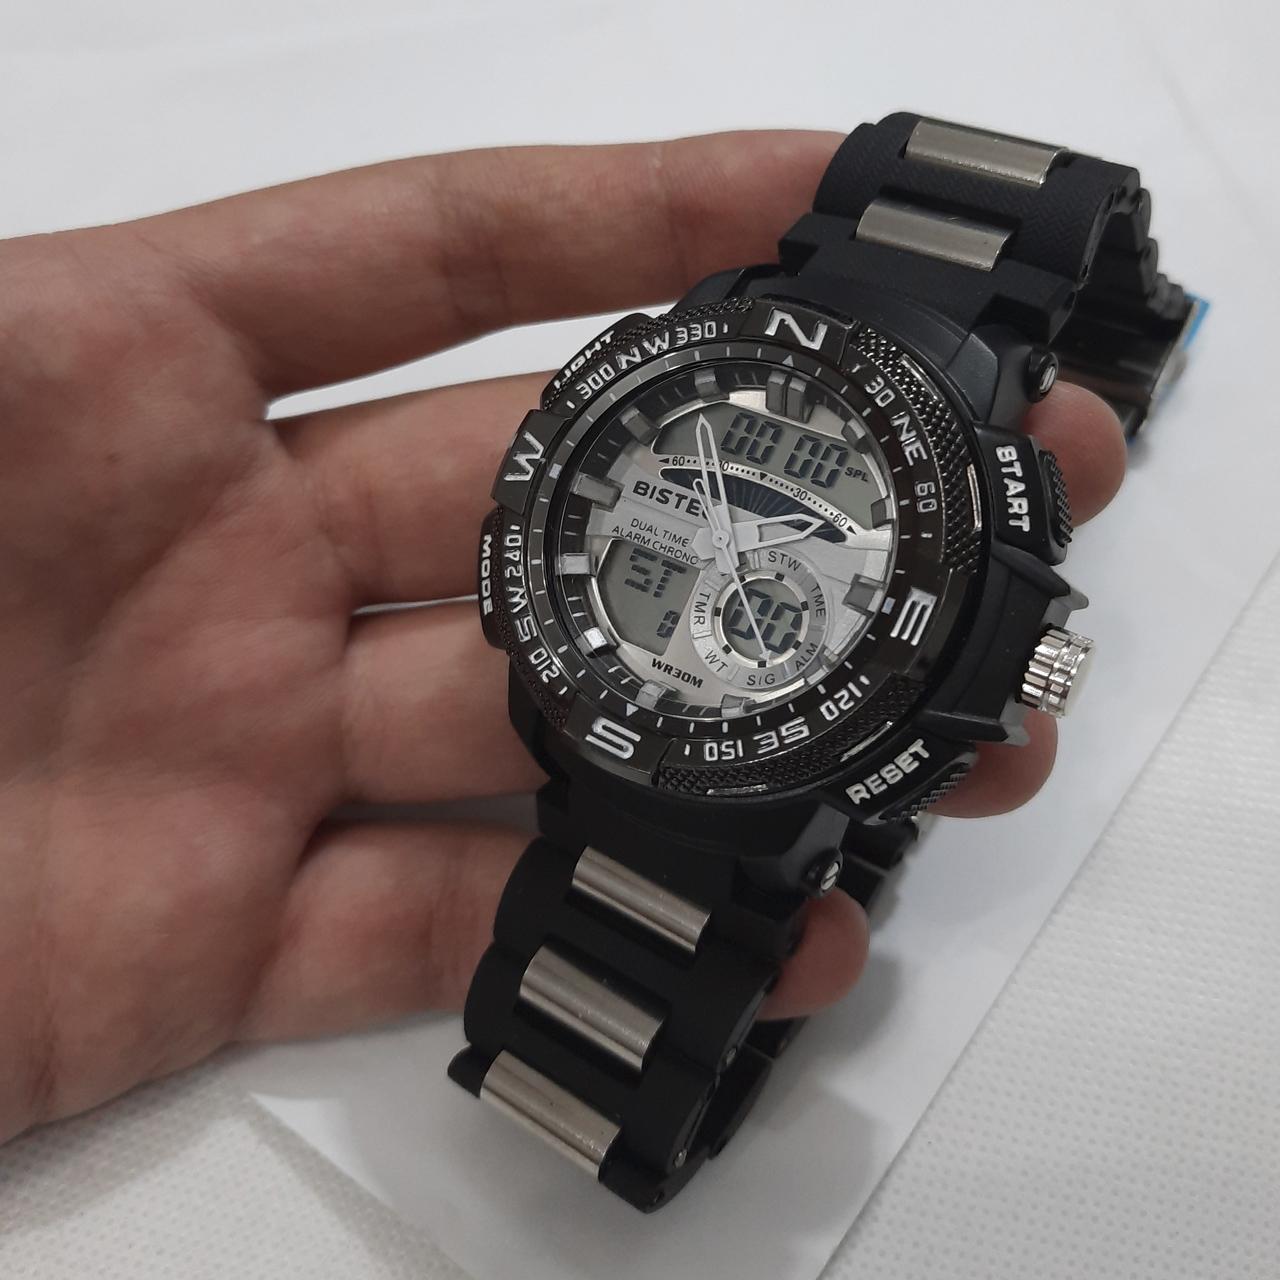 ساعت مچی  مدل A 71 S